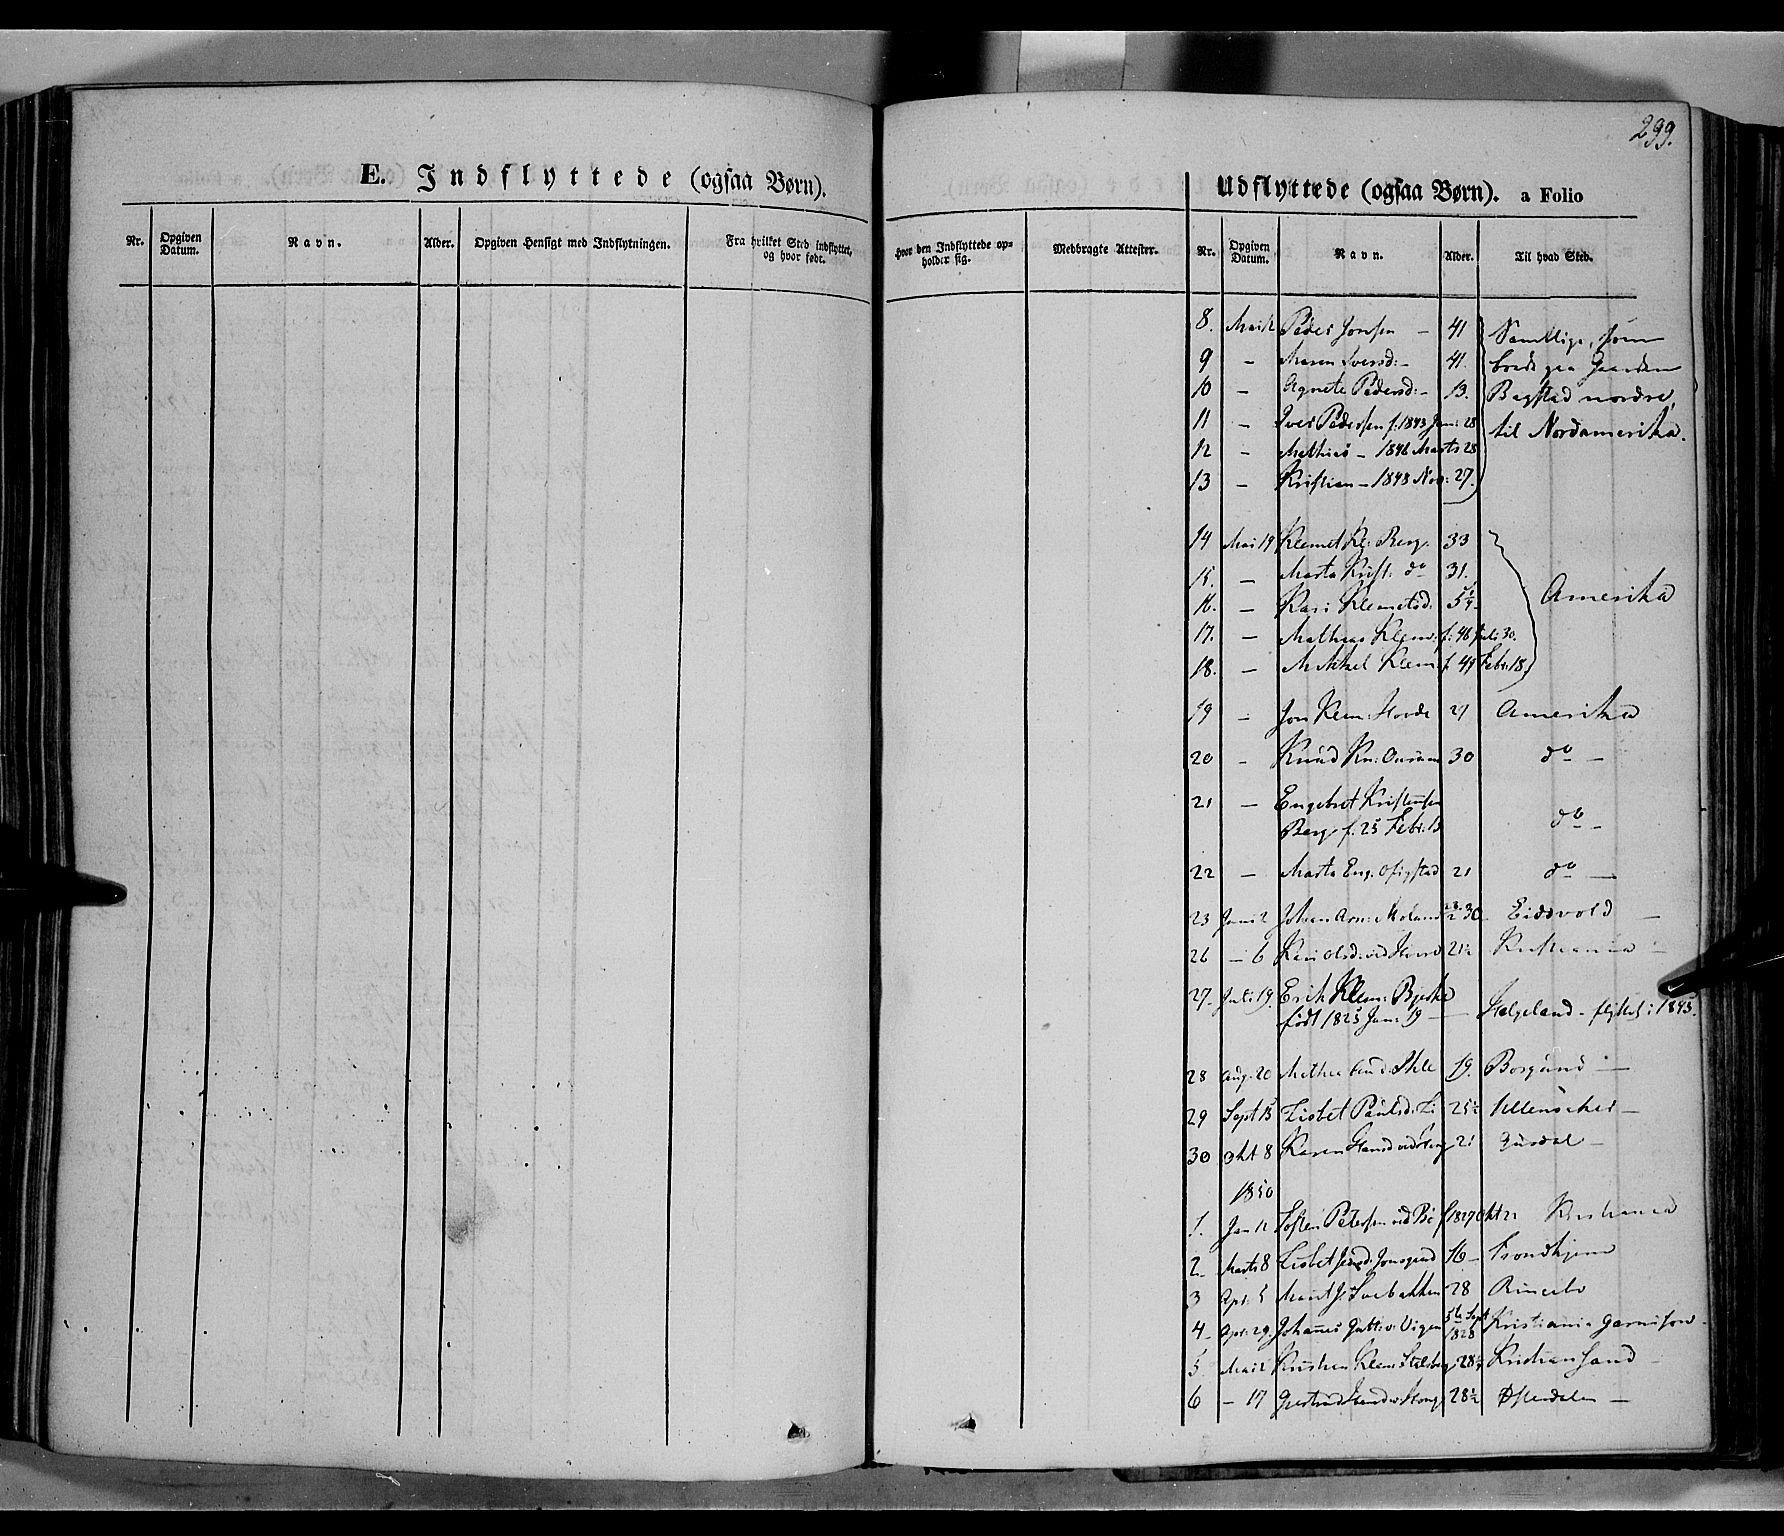 SAH, Øyer prestekontor, Ministerialbok nr. 5, 1842-1857, s. 299